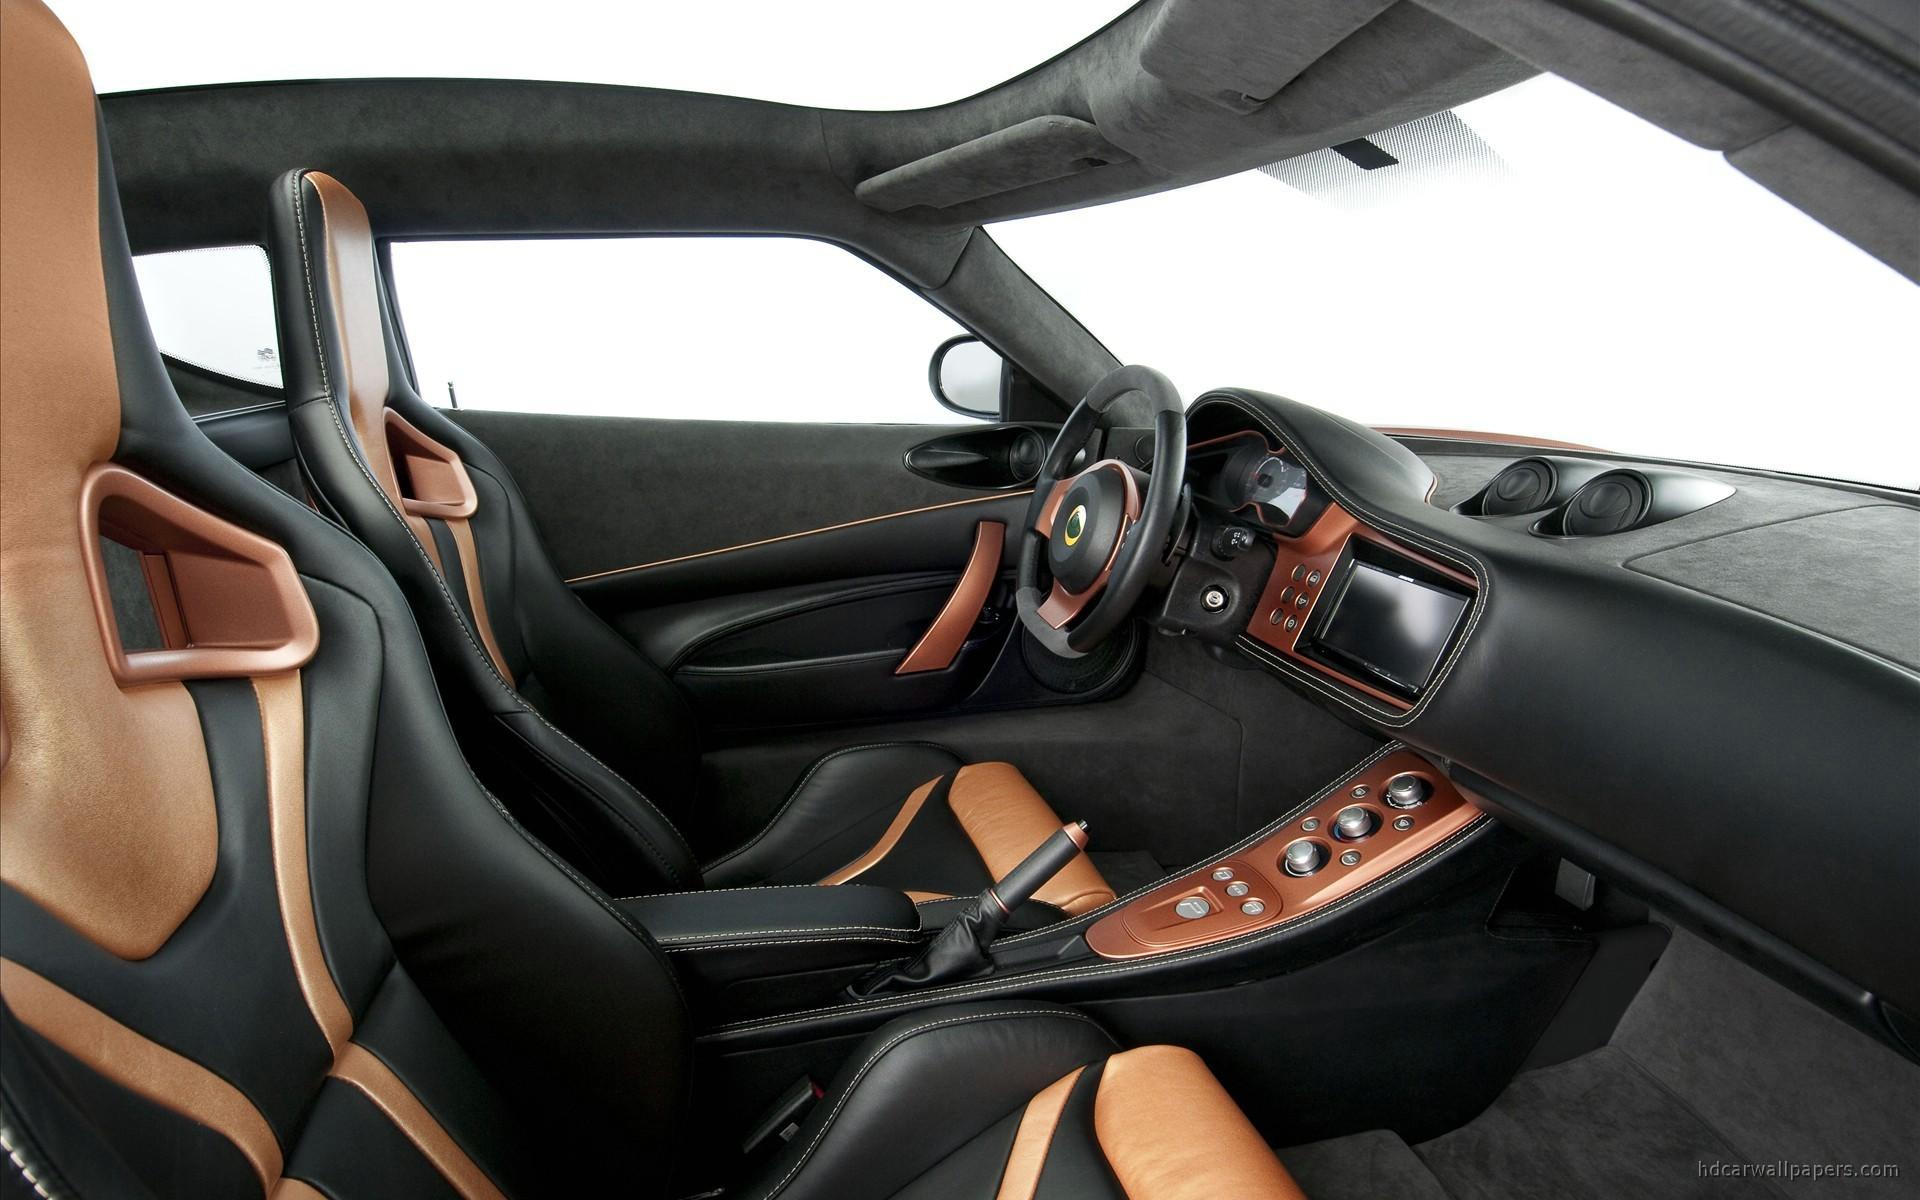 Lotus Evora E Hybrid Interior Wallpaper HD Car Wallpapers